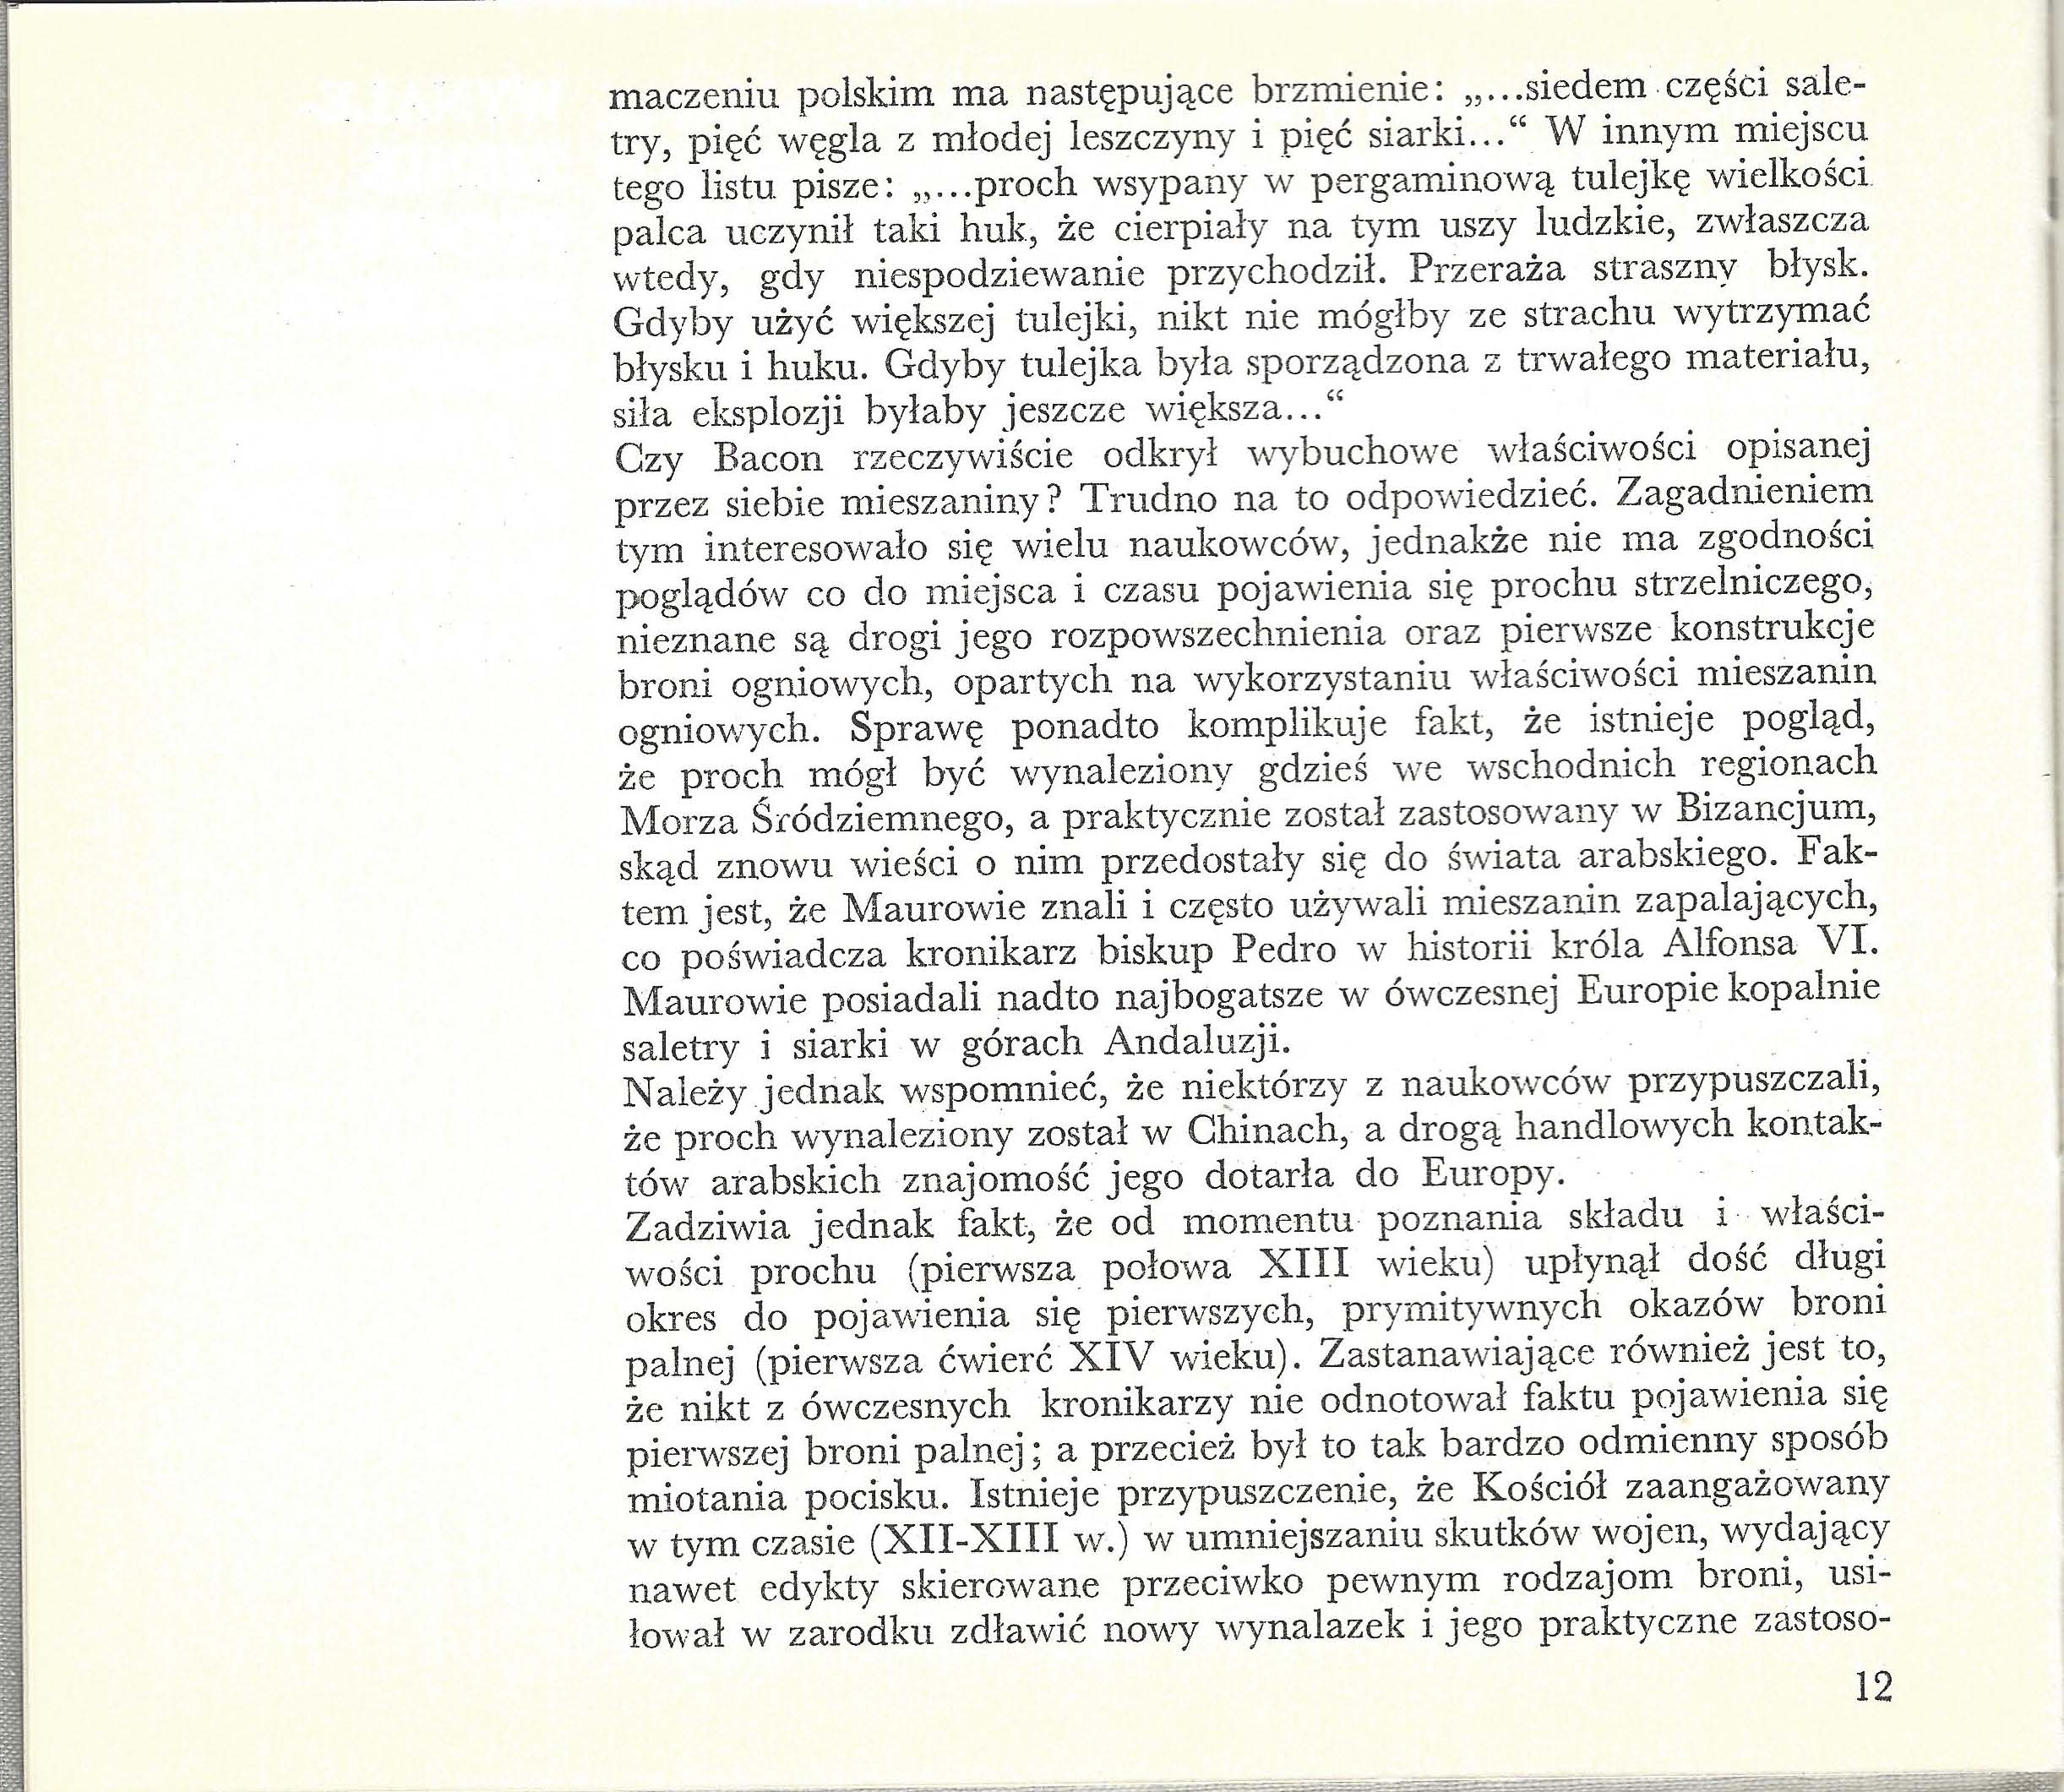 polska.bron.palna.kobielski1-14_Strona_10